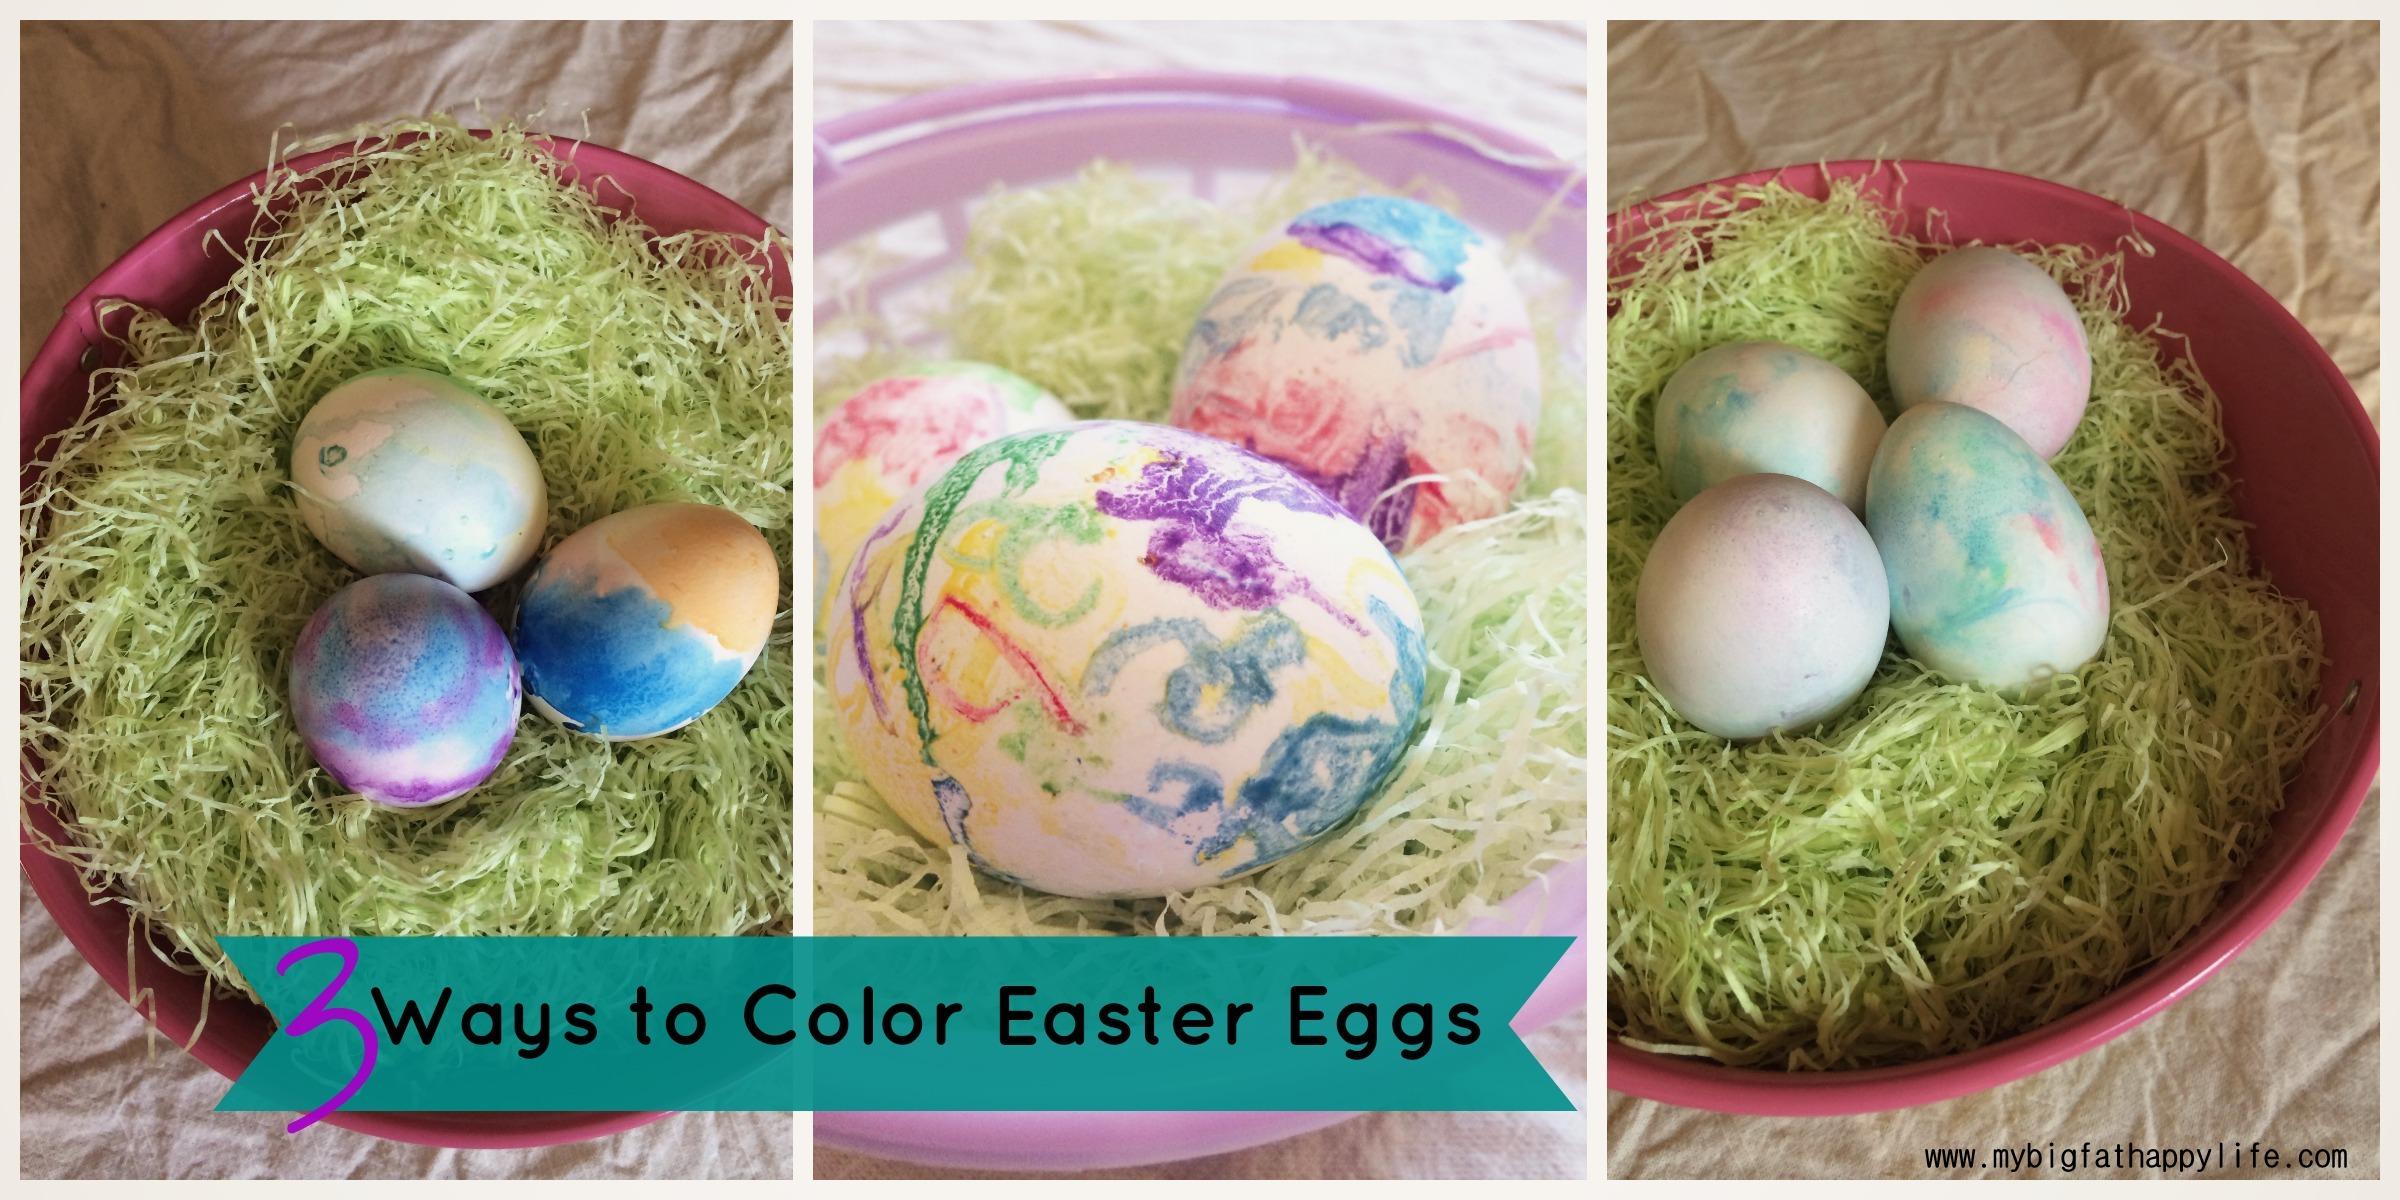 3 Ways to Color Easter Eggs   mybigfathappylife.com